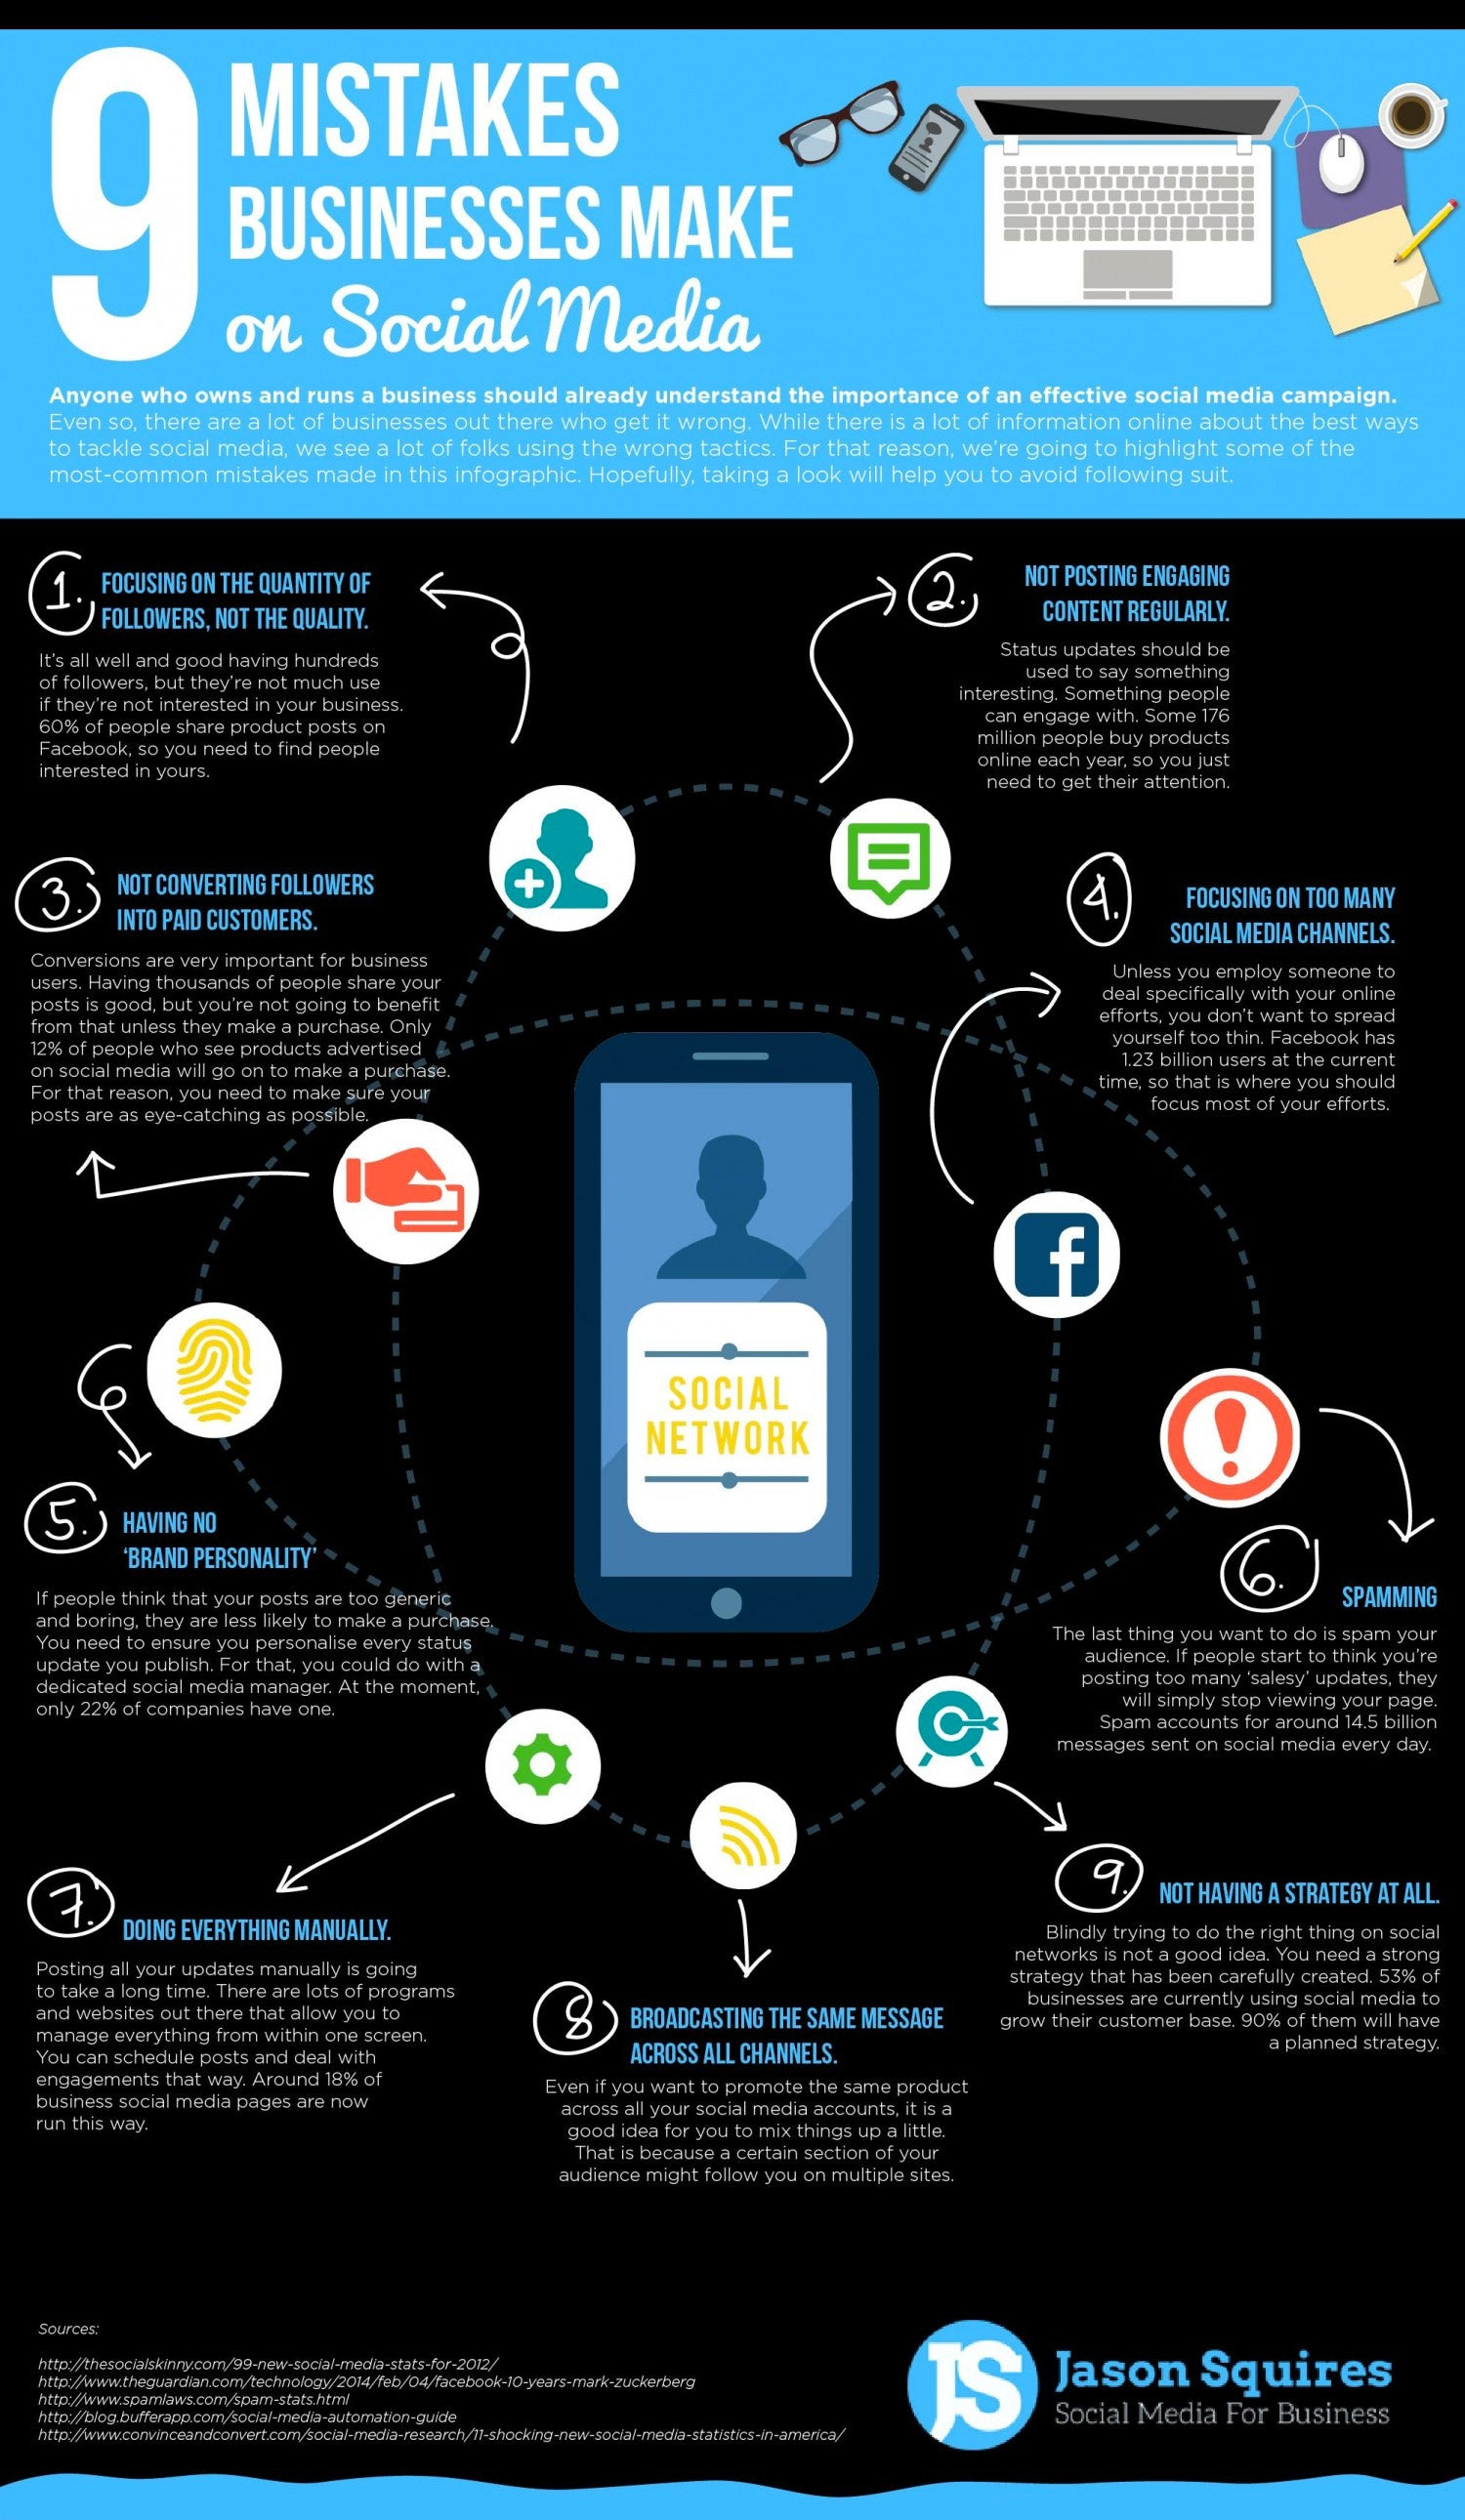 9 social media 'fouten' die je kan voorkomen